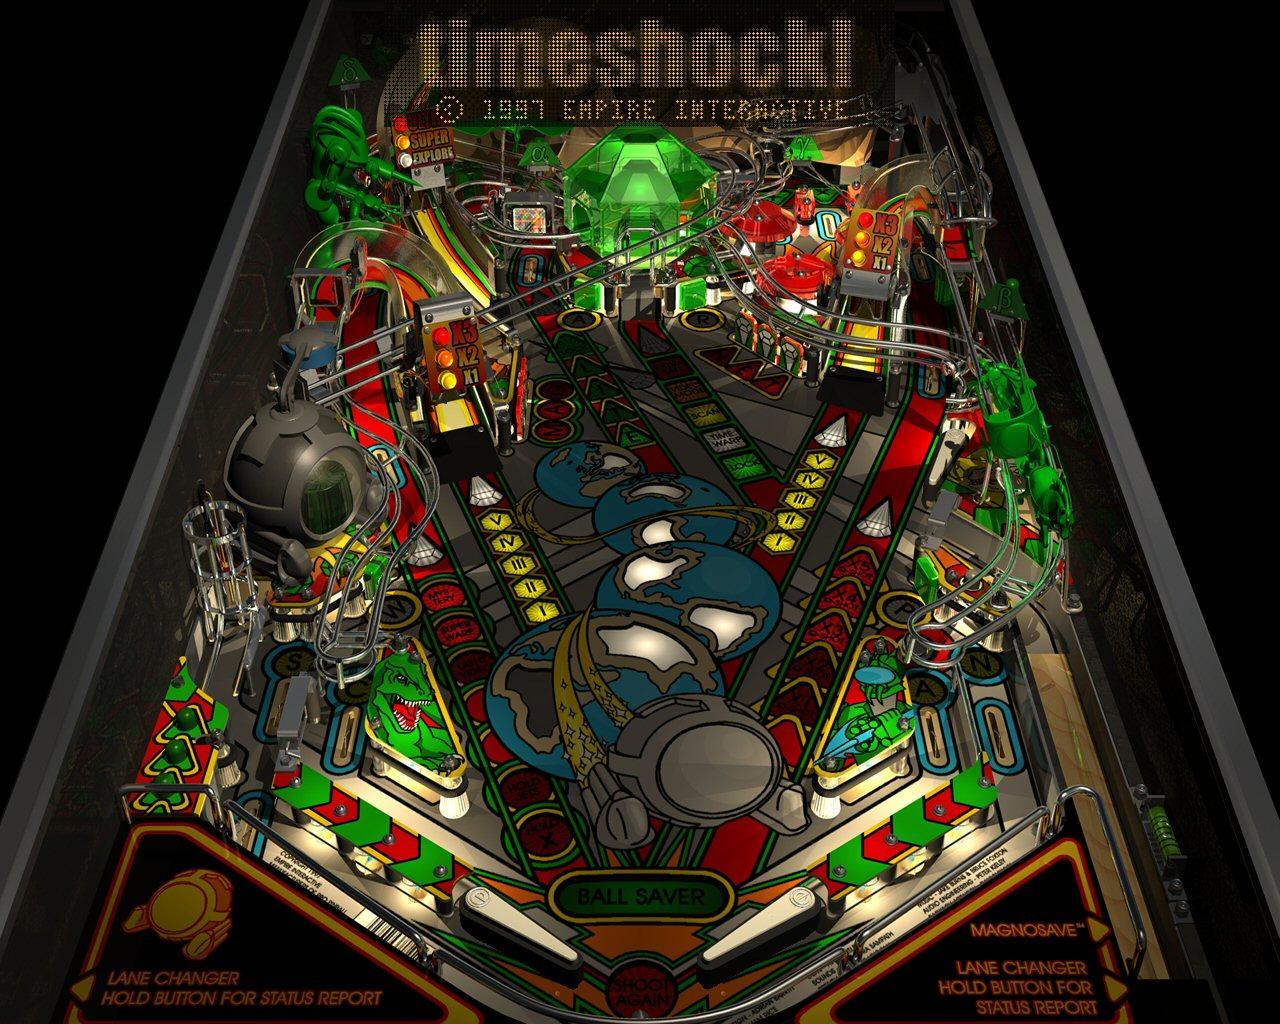 Pro Pinball [Archive] - Digital Pinball Fans